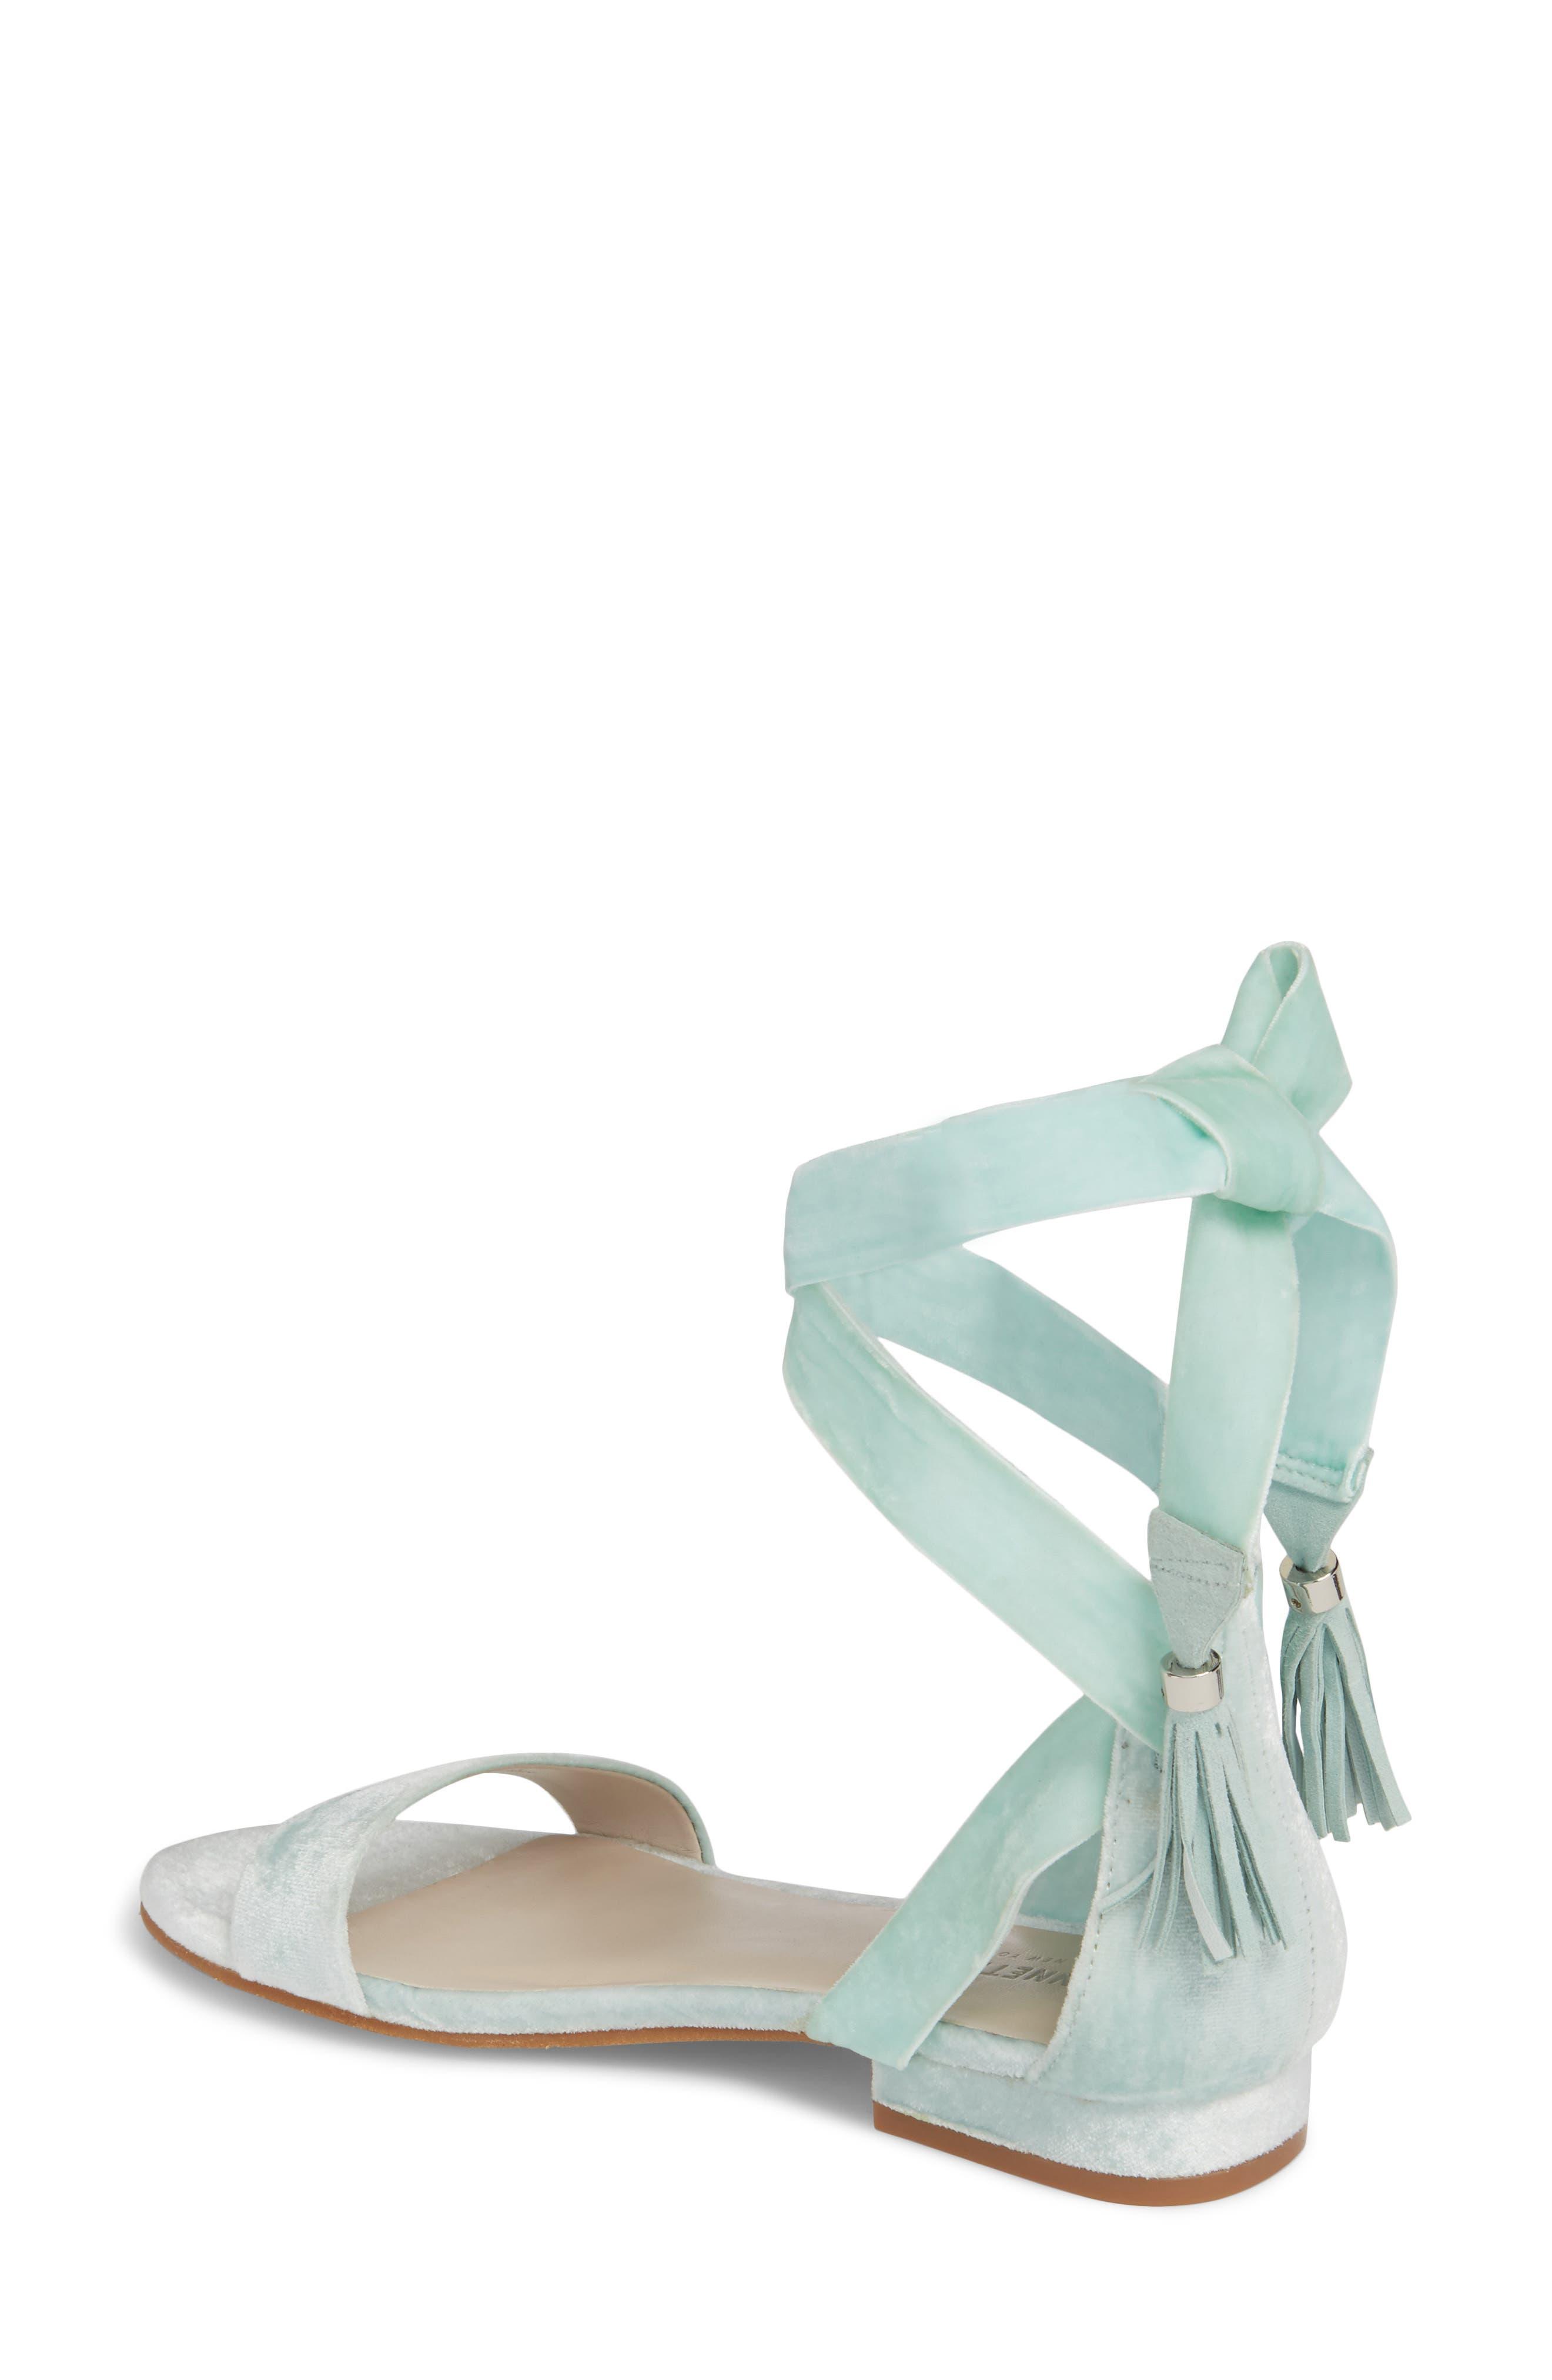 Valen Tassel Lace-Up Sandal,                             Alternate thumbnail 22, color,